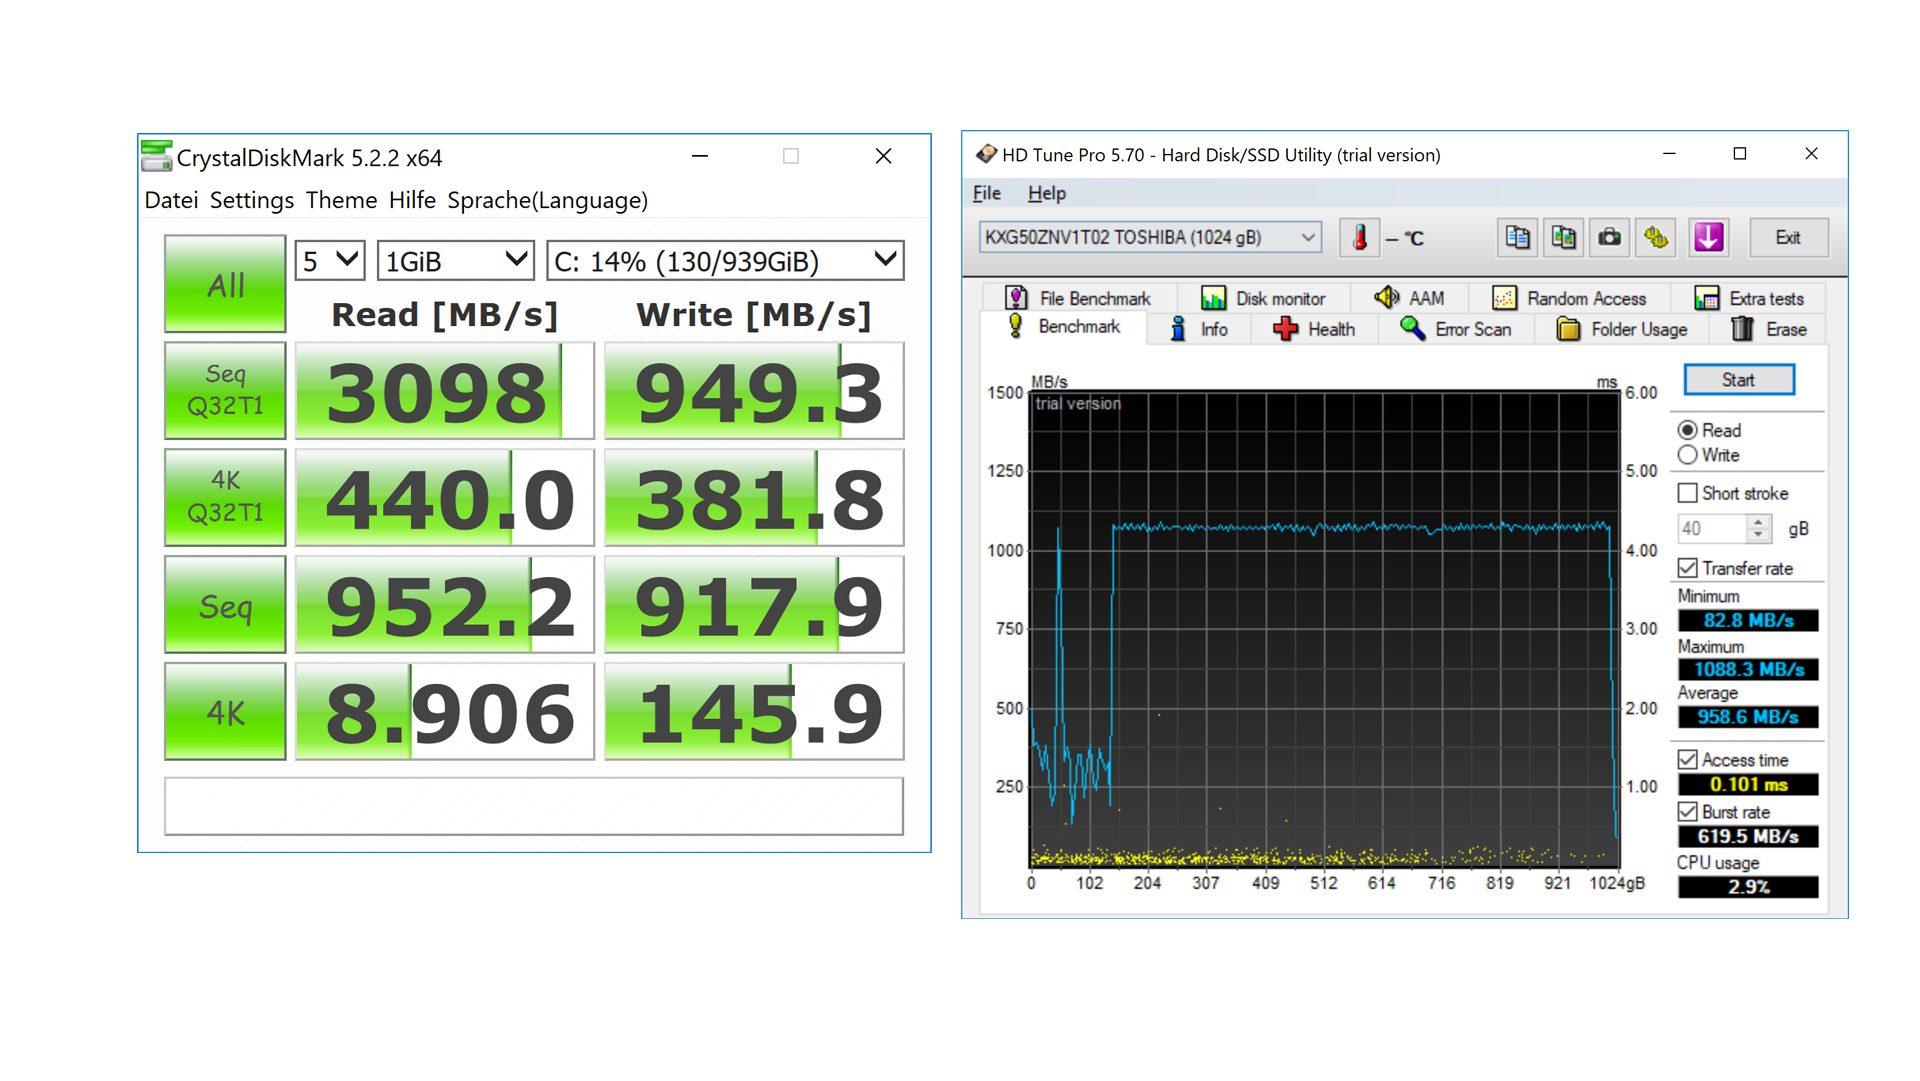 HP Spectre x360 15-ch002ng Benchmark_7